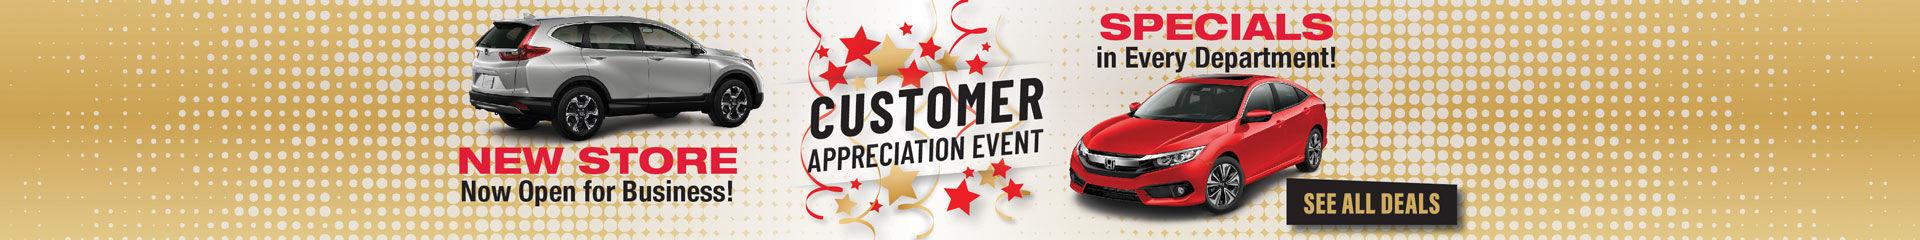 2018-10 Customer Appreciation